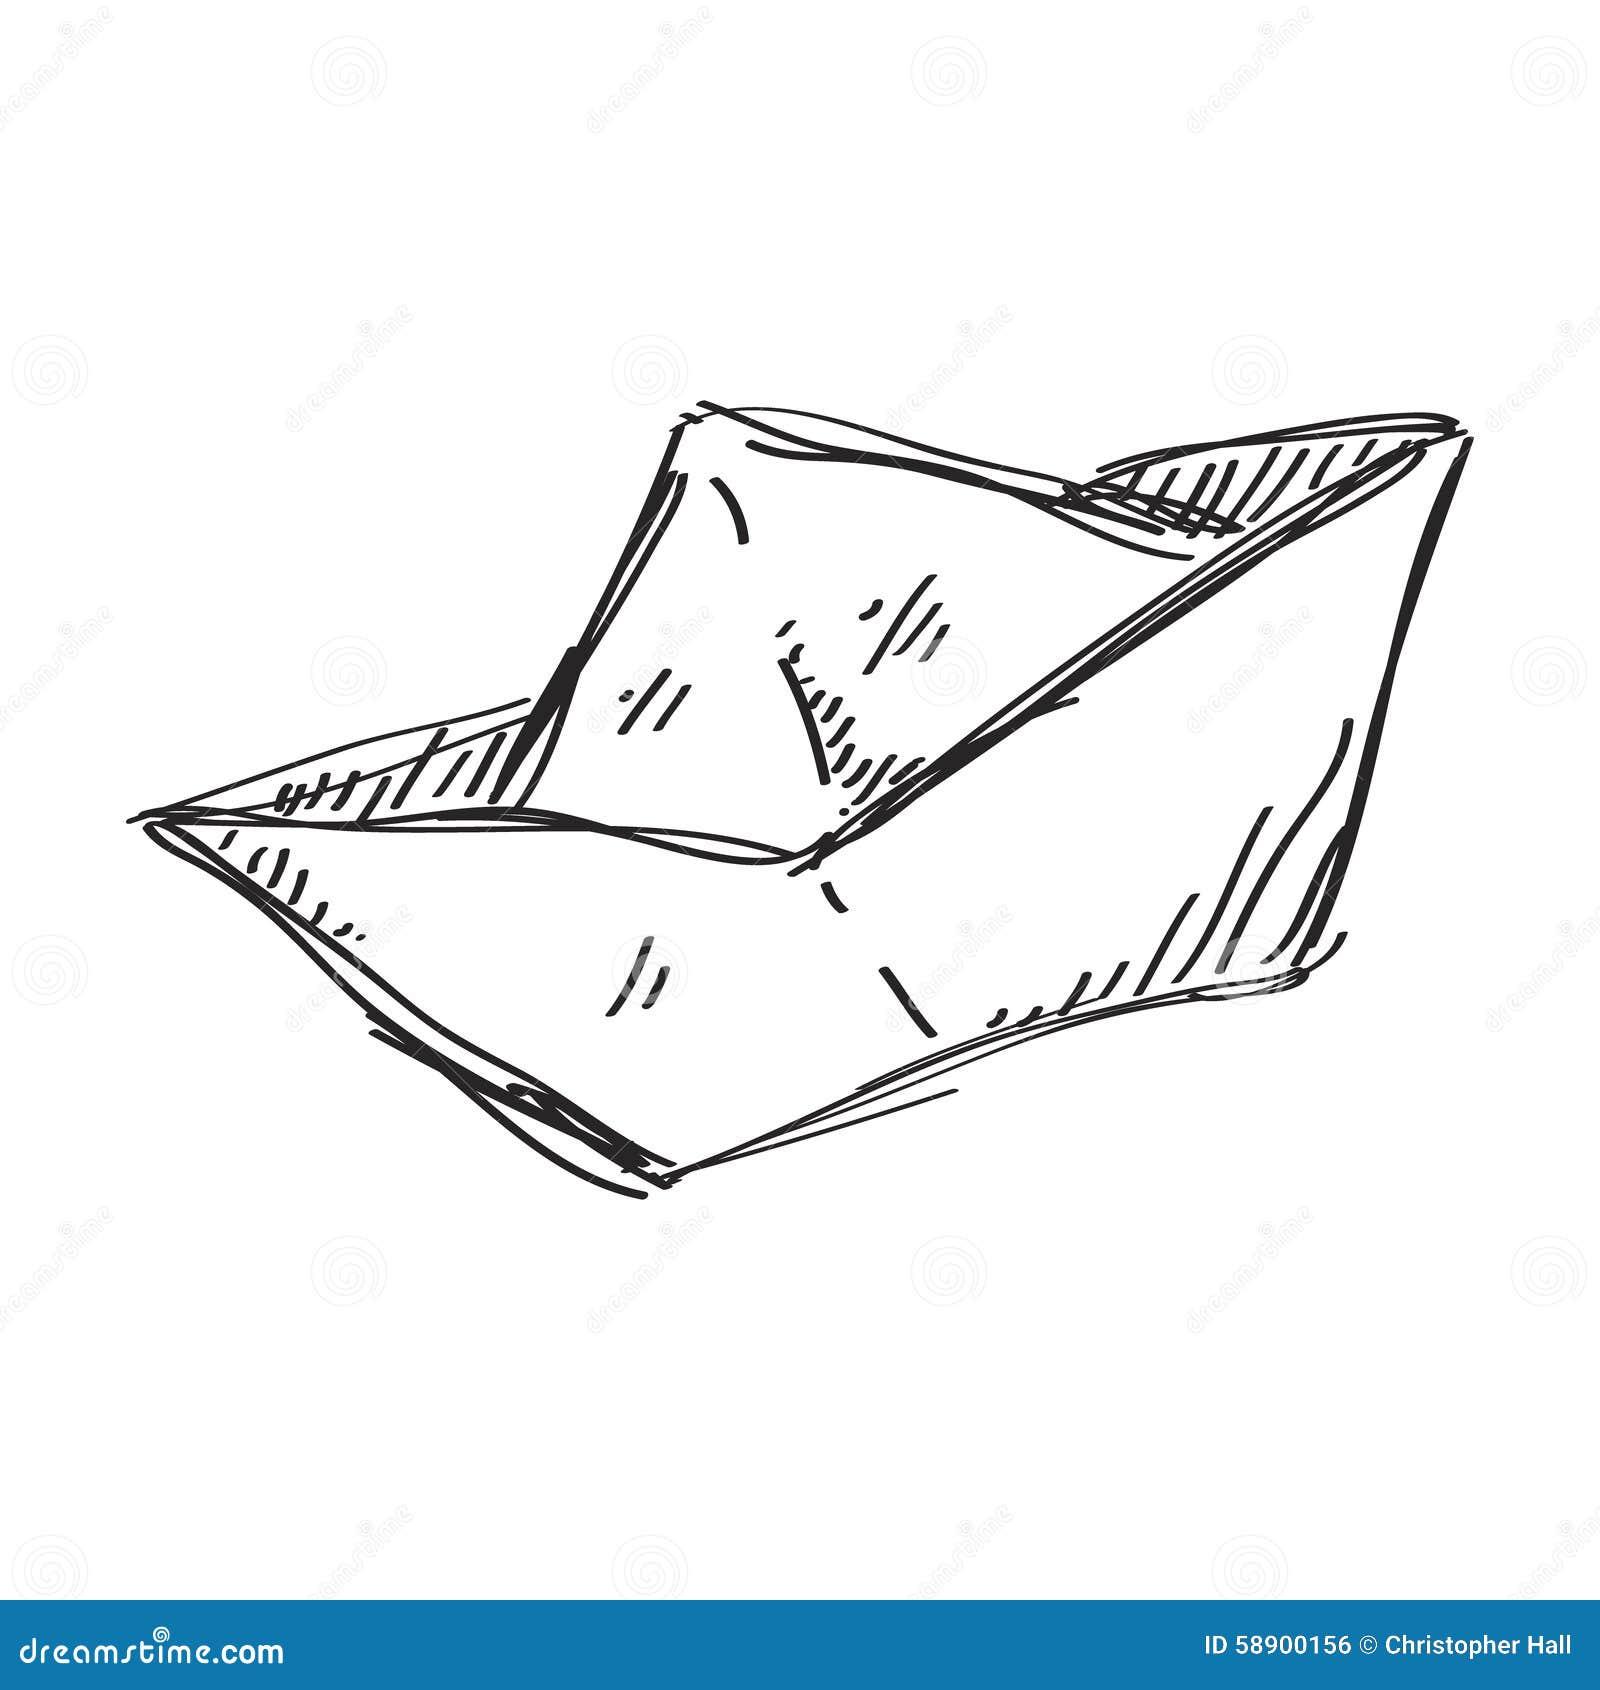 ship drawing paper - photo #12